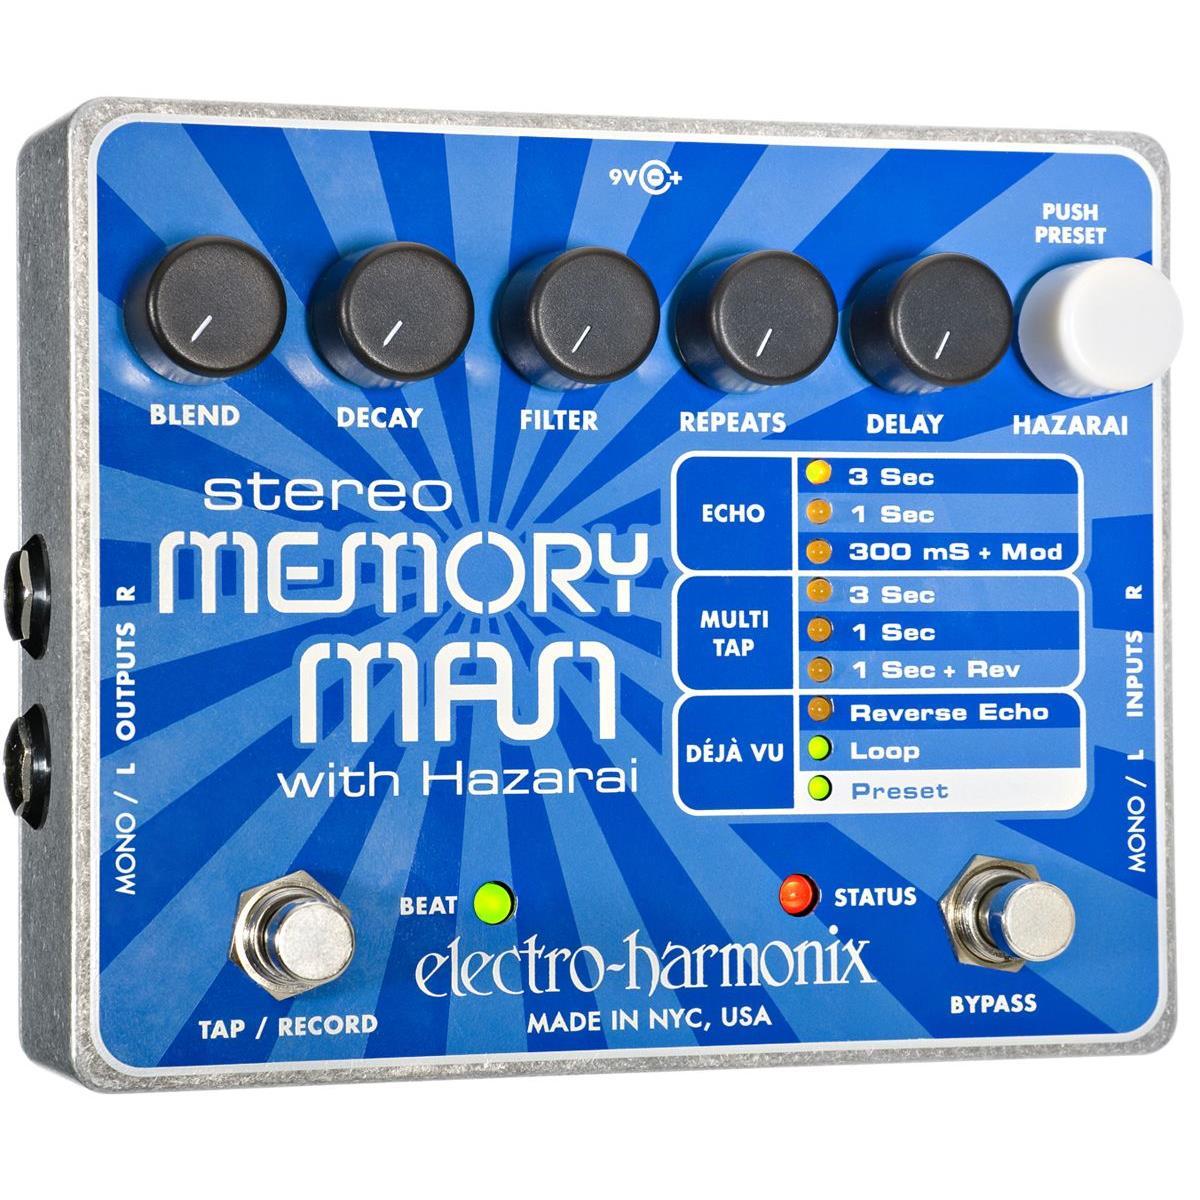 ELECTRO-HARMONIX-STEREO-MEMORY-MAN-WITH-HAZARAI-sku-1549